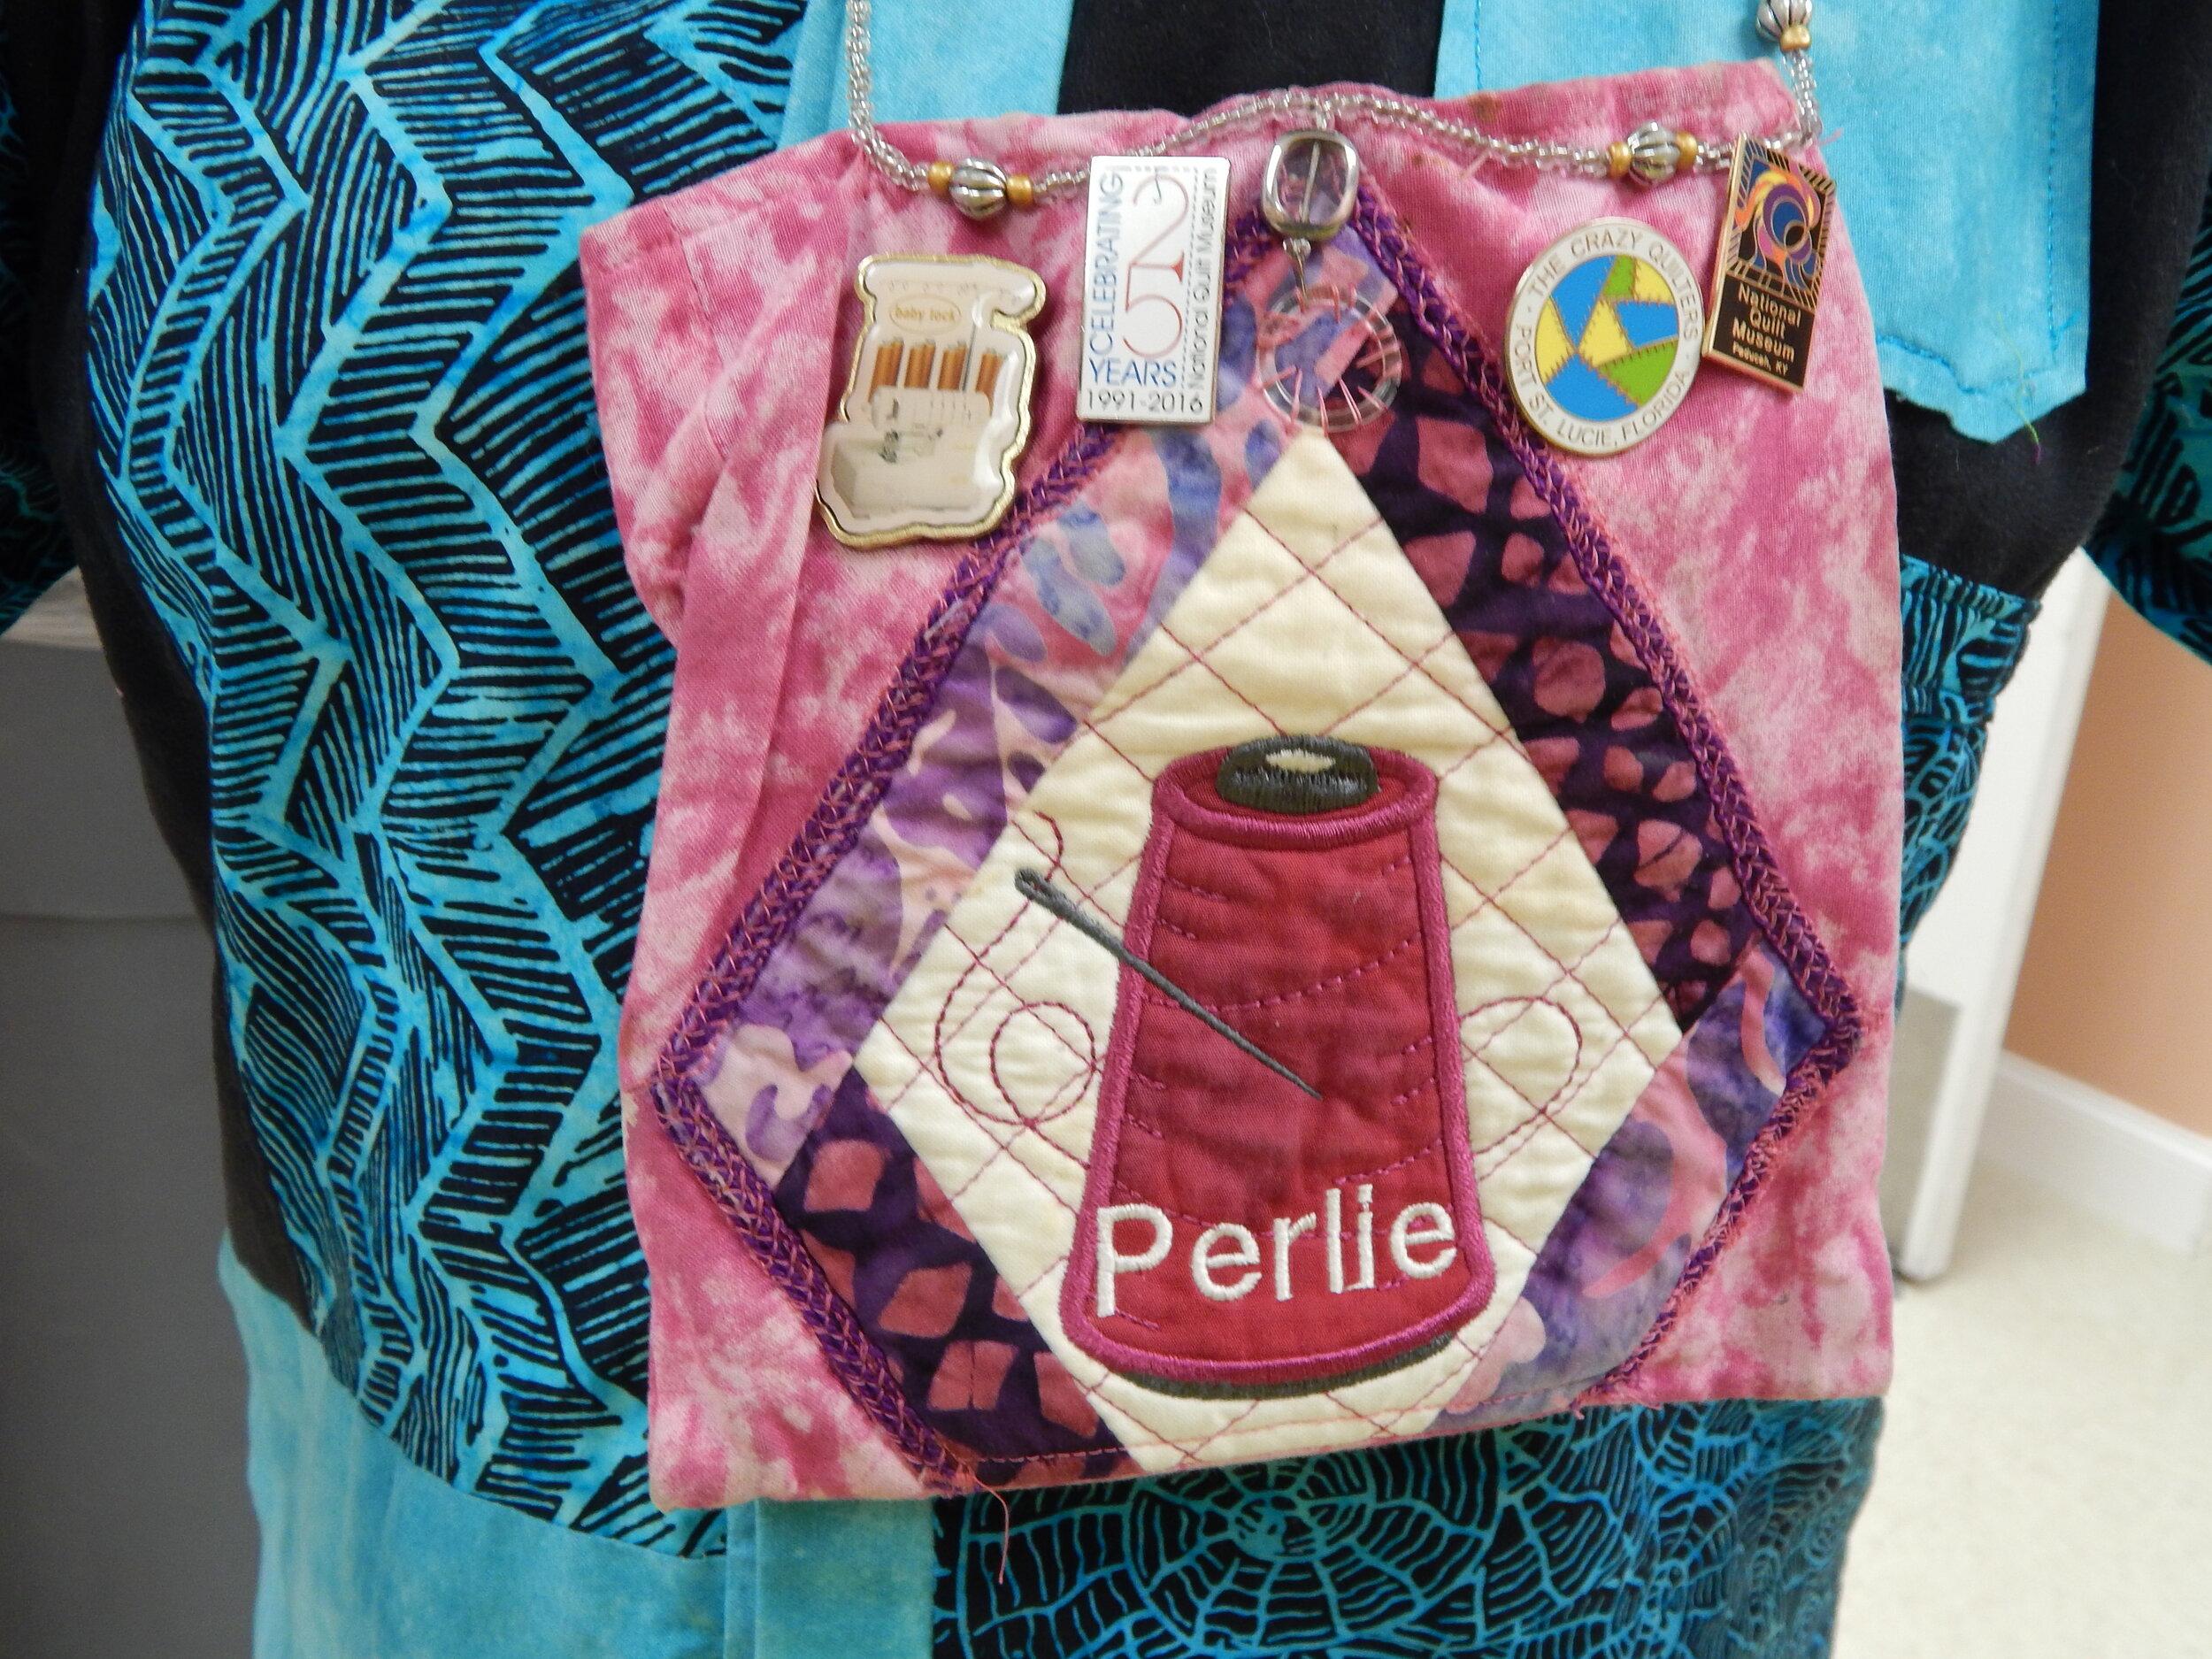 Phyllis (Perlie) Petrillo2.JPG